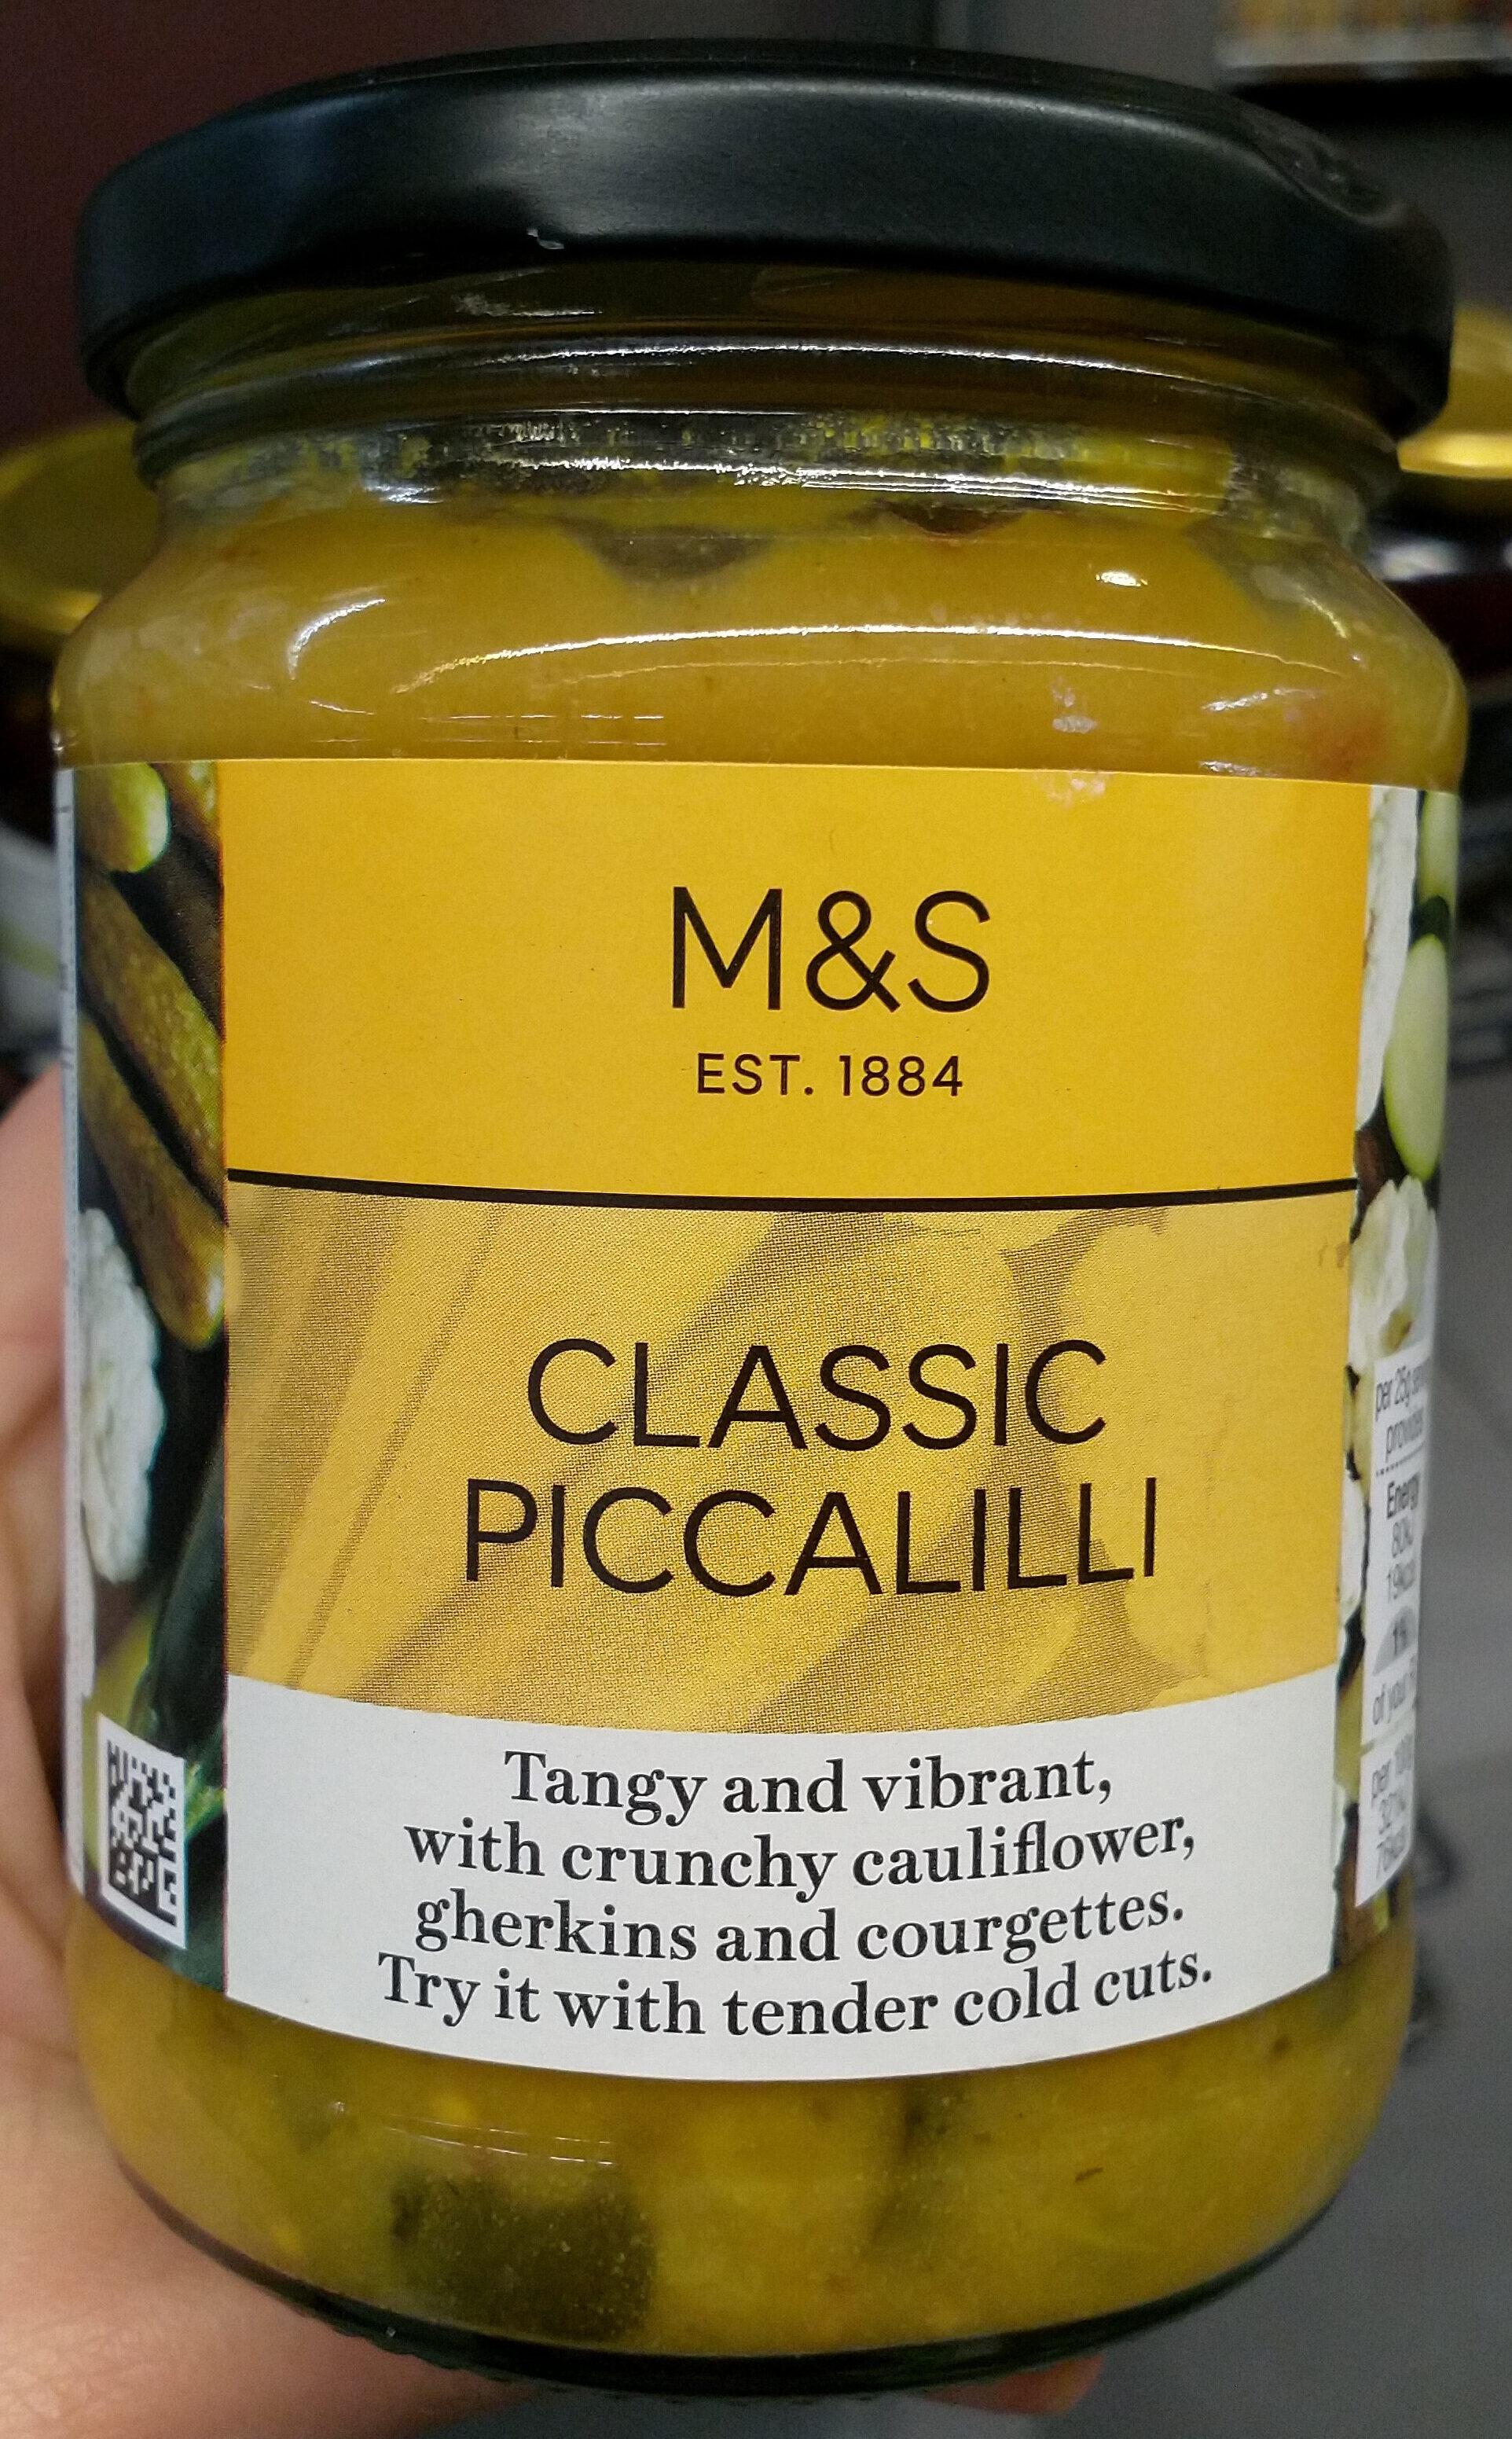 Classic piccadilli - Product